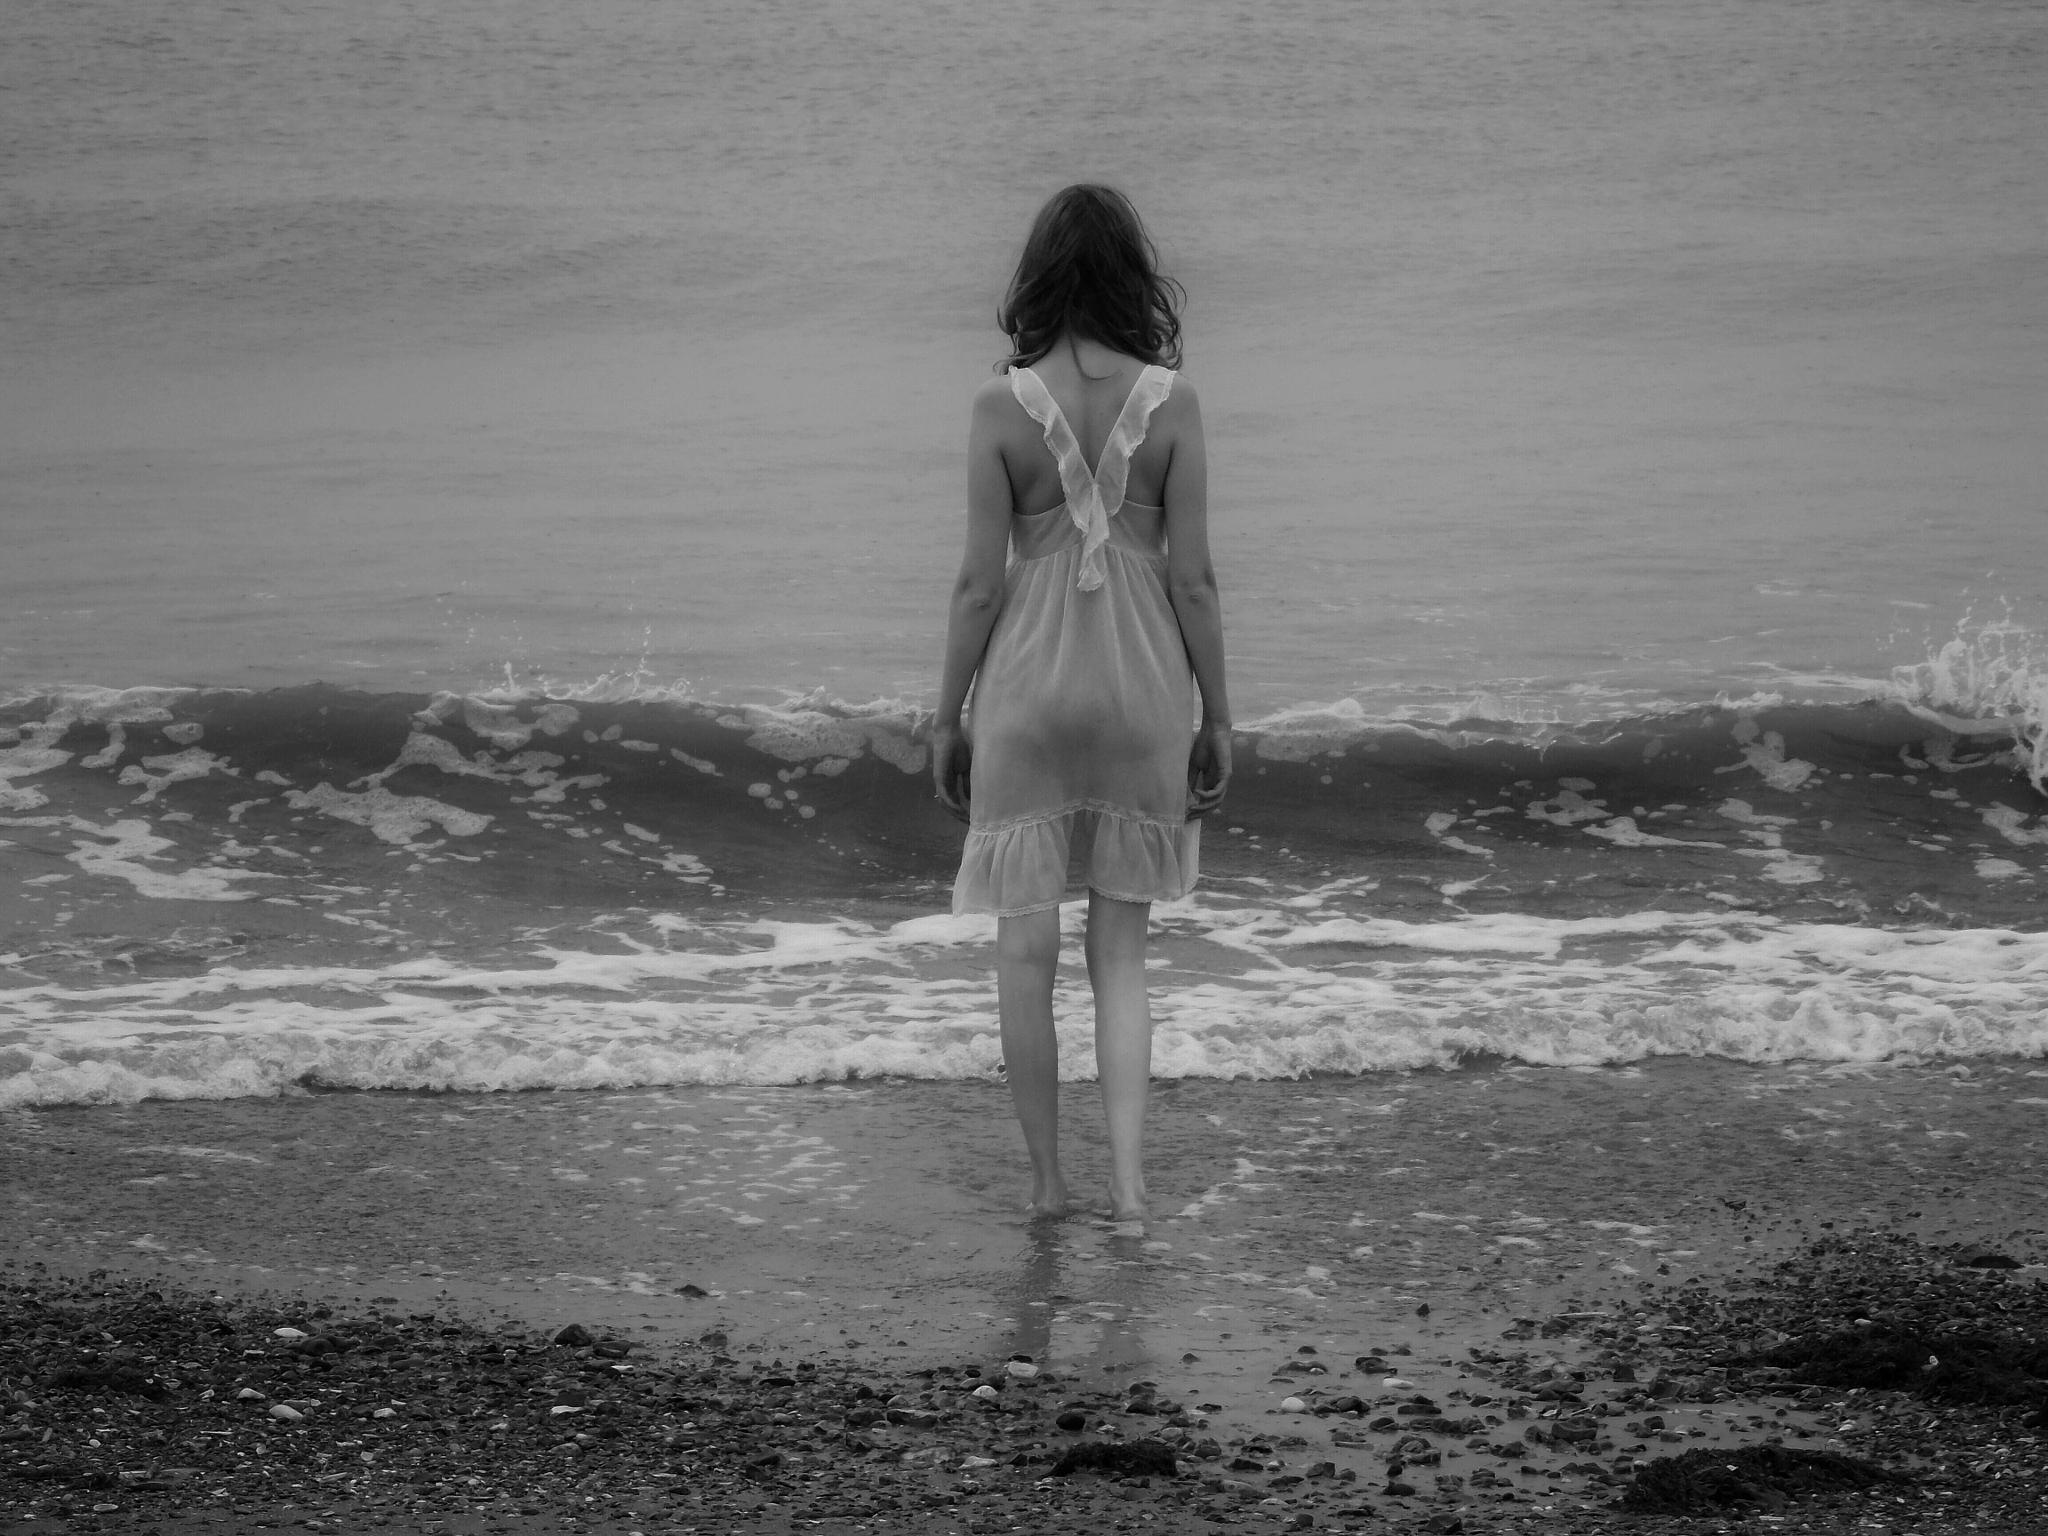 The Water by bethjayn